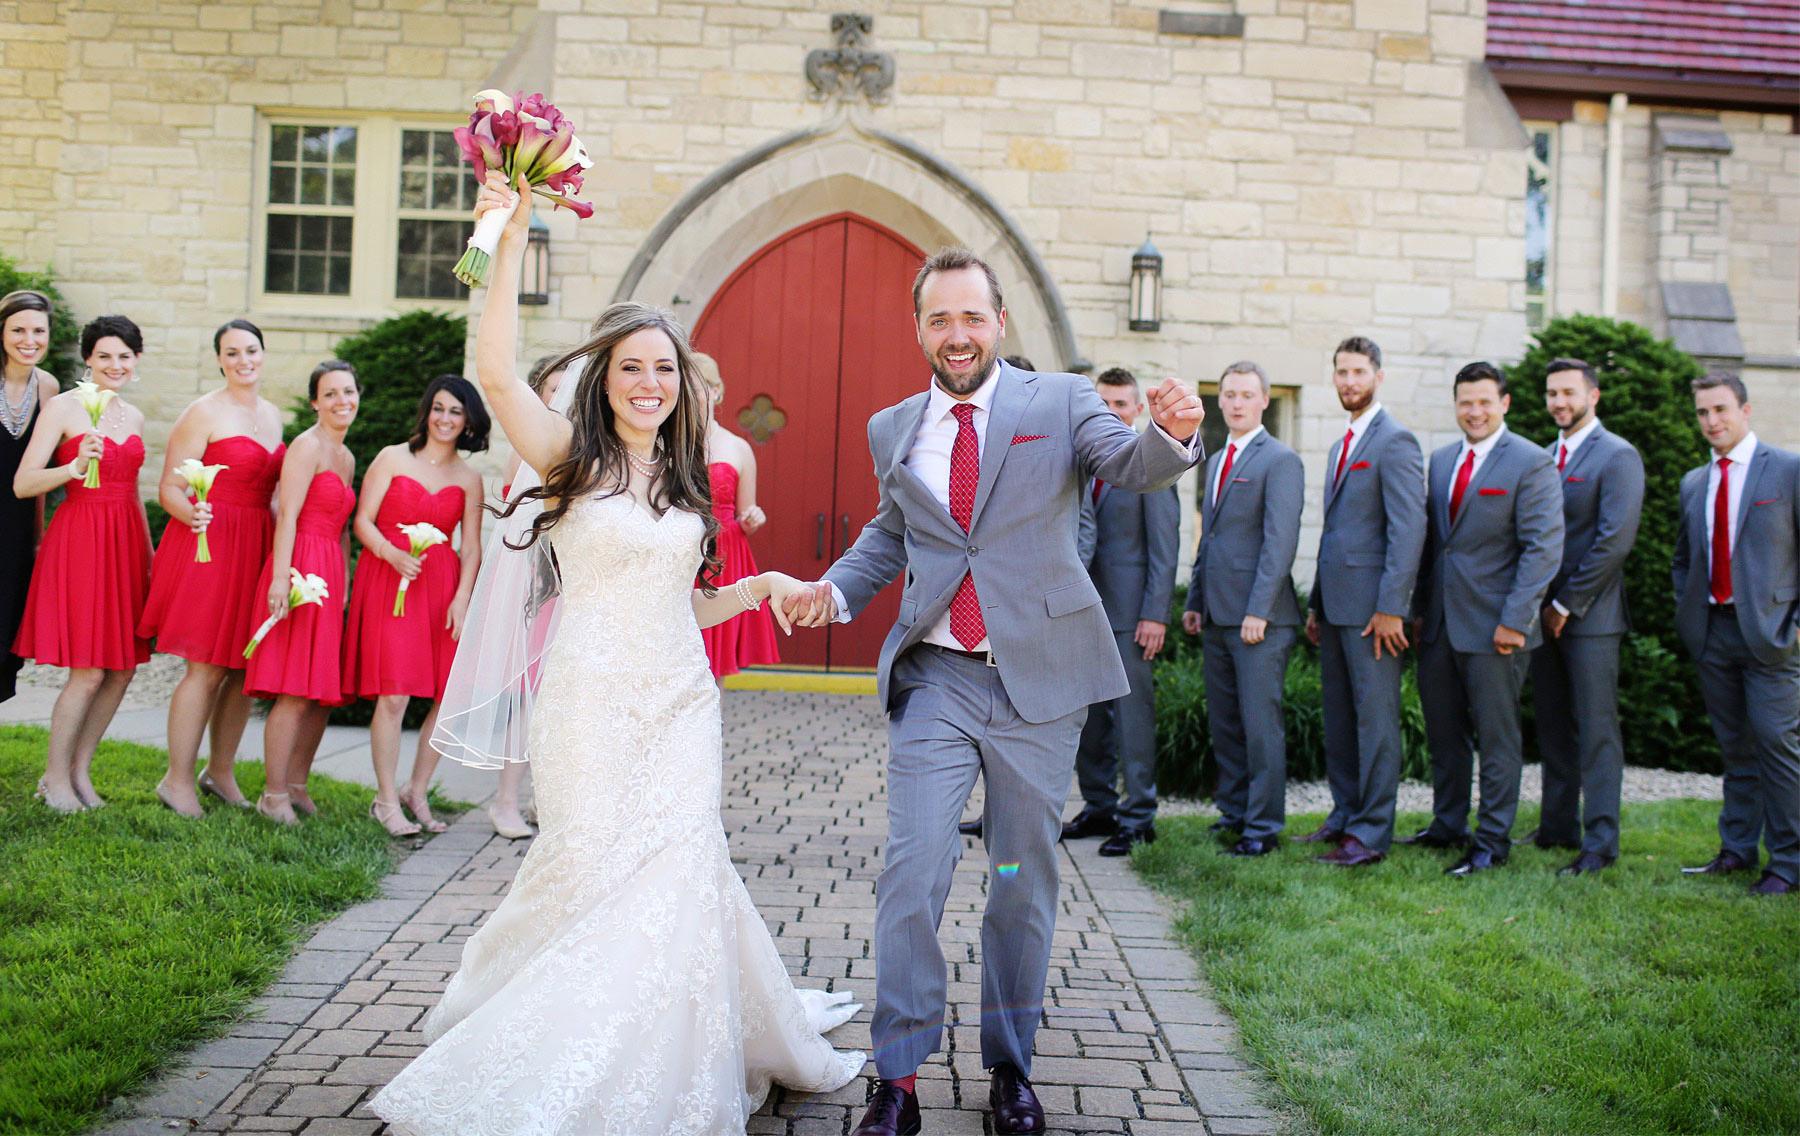 15-Minneapolis-Minnesota-Wedding-Photographer-by-Andrew-Vick-Photography-Summer-Diamond-Lake-Church-Celebration-Excited-Bridesmaids-Groomsmen-Bride-Groom-Natalie-and-Andrew.jpg